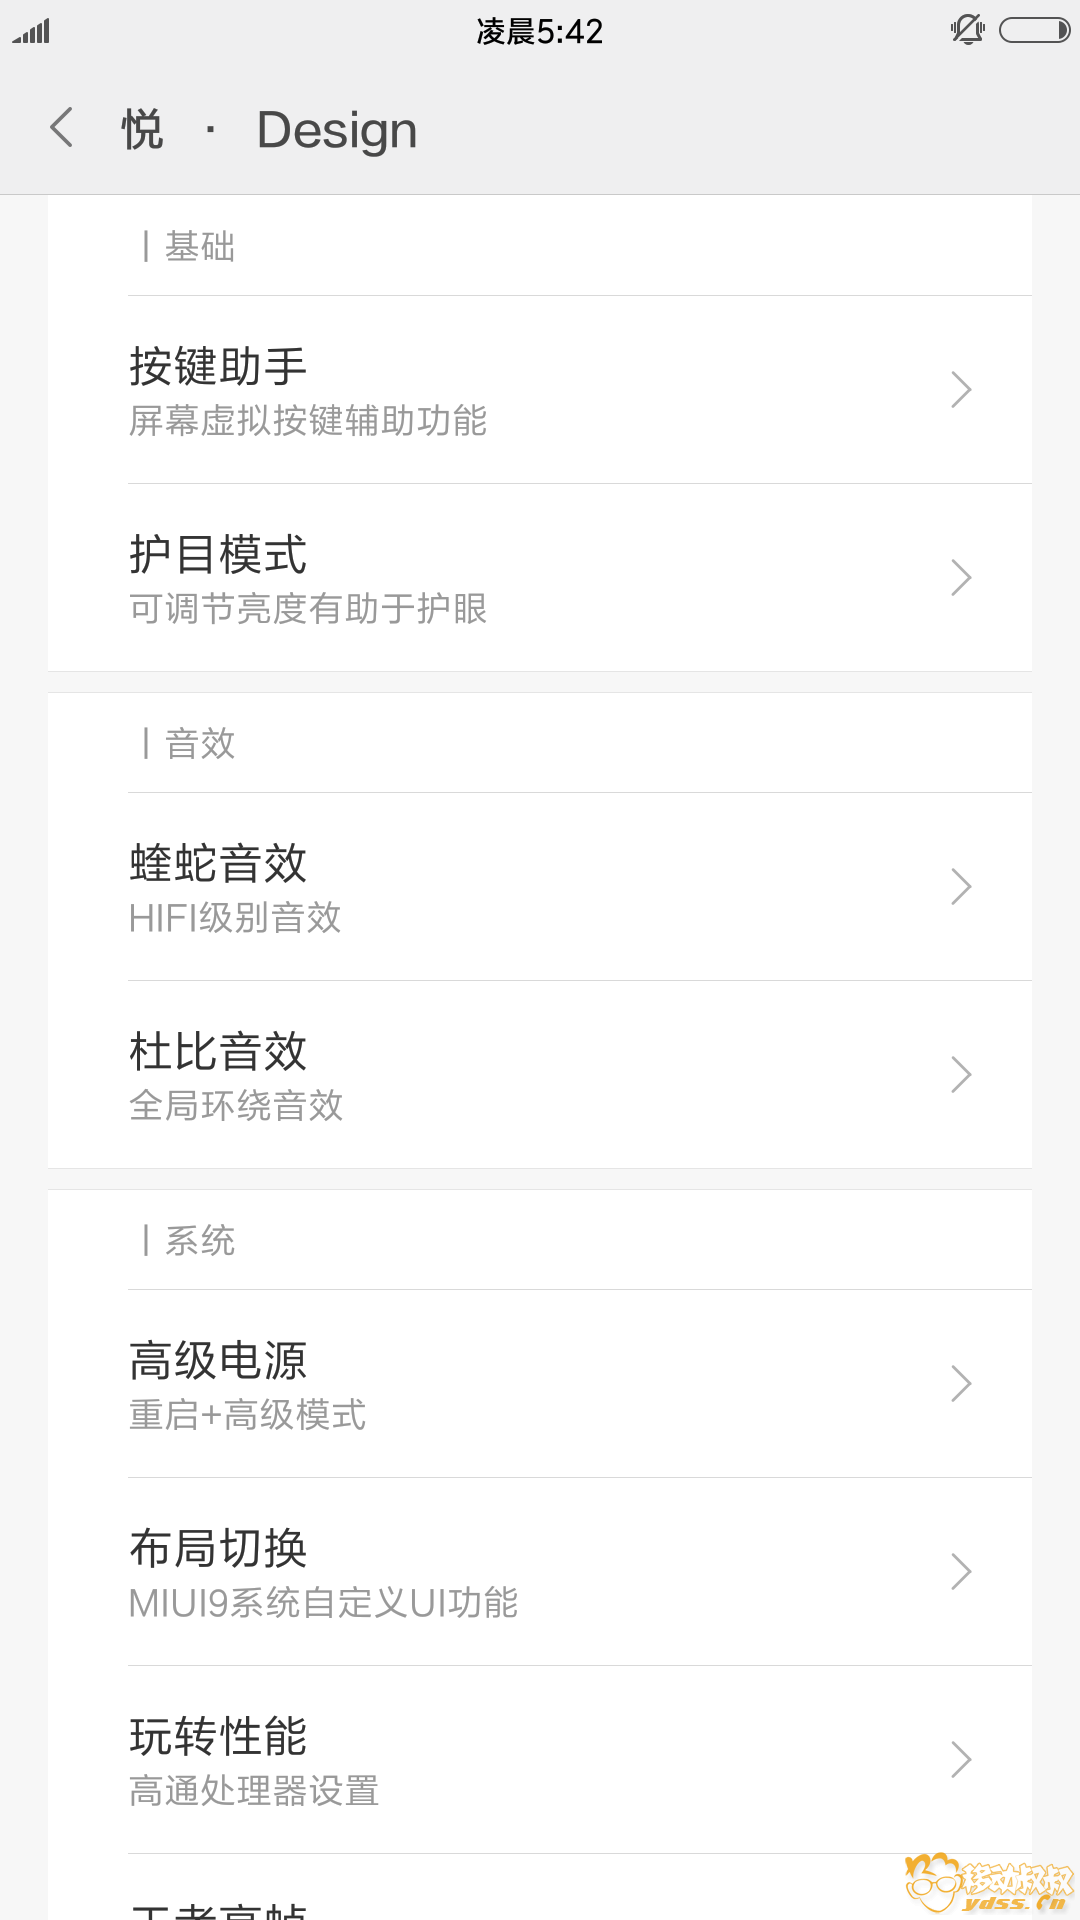 Screenshot_2018-01-09-05-42-54-079_com.mrxy.design.png